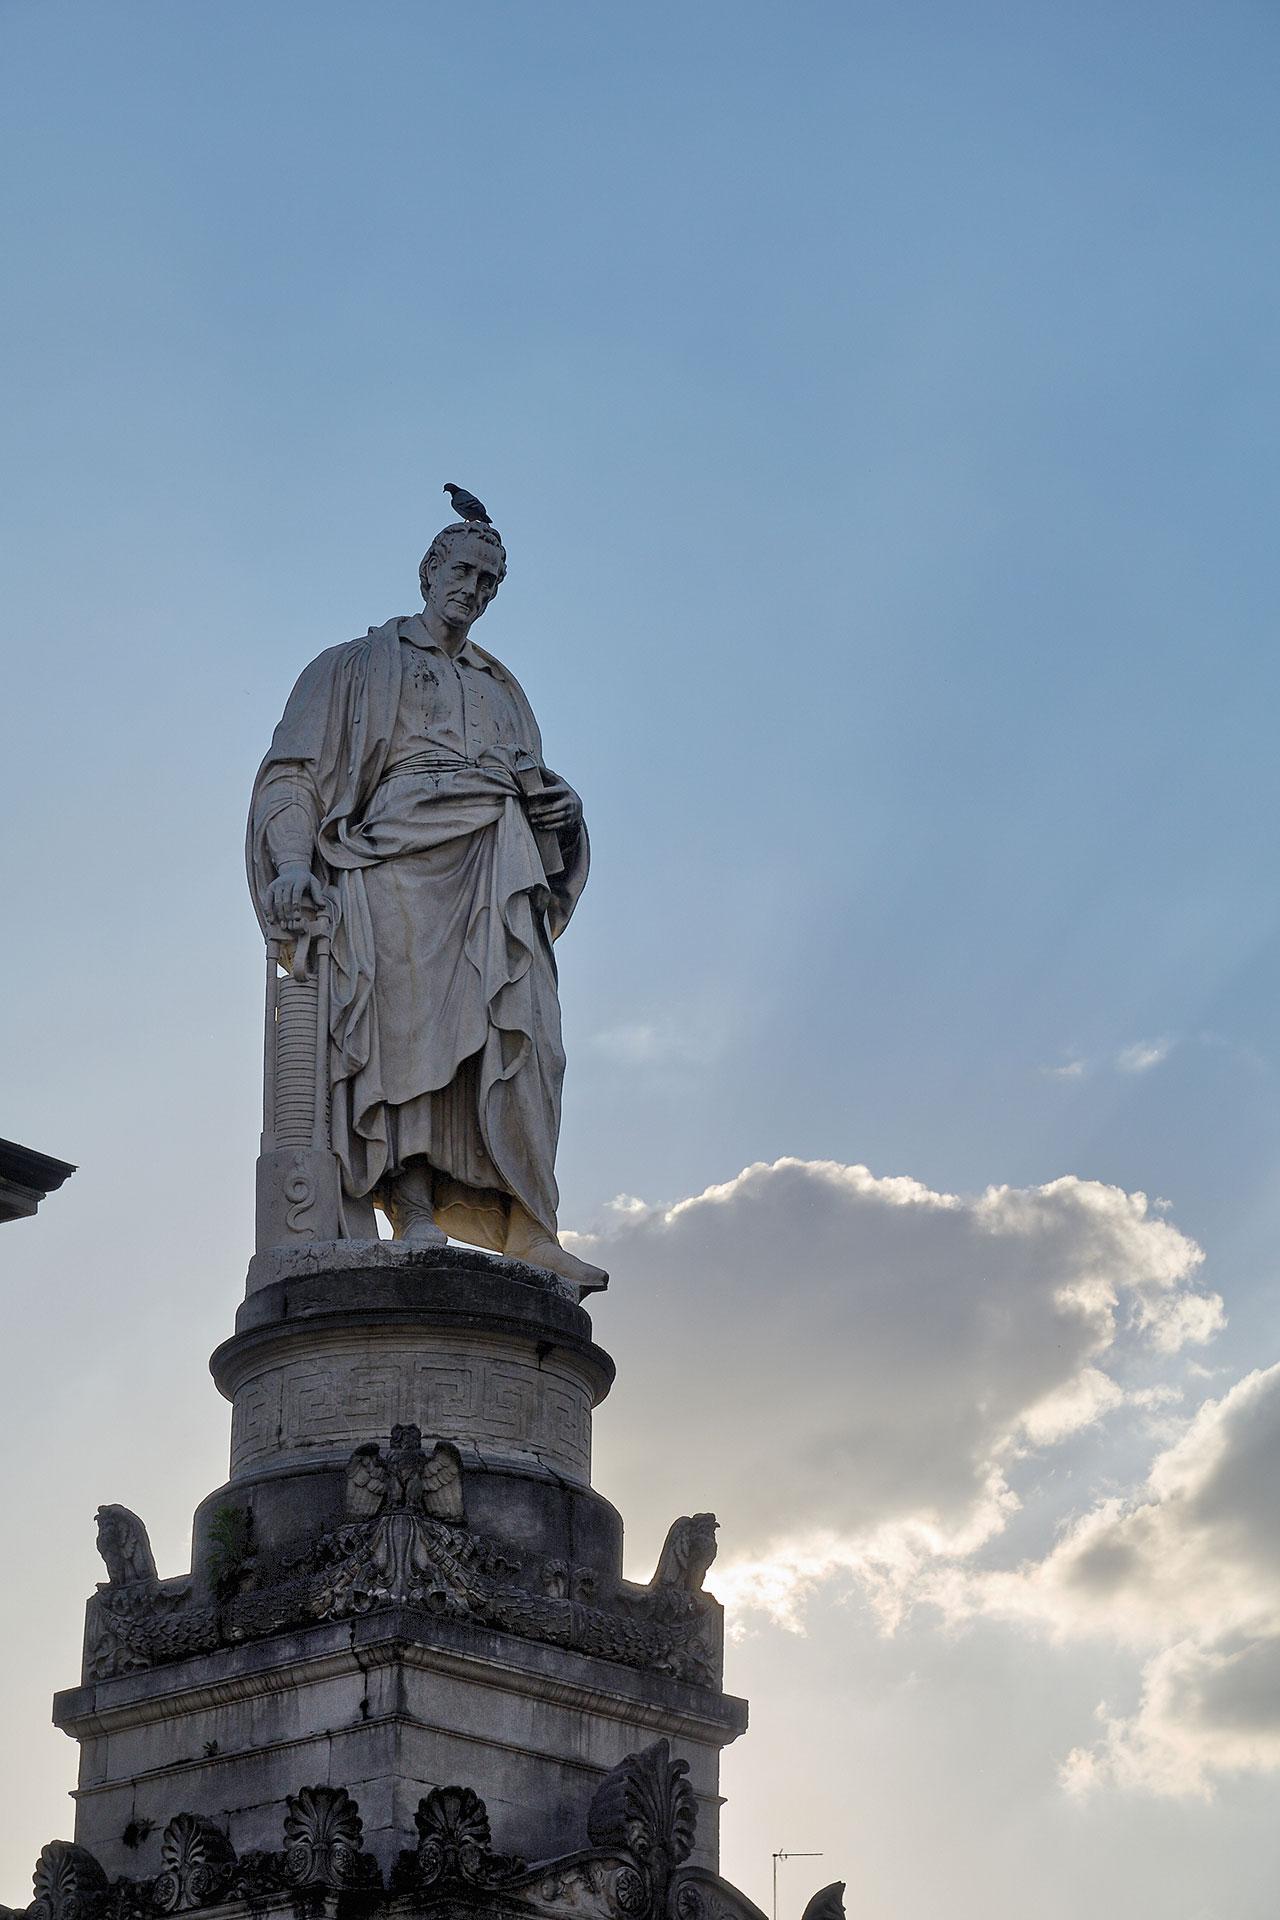 Mr. Alessandro Volta